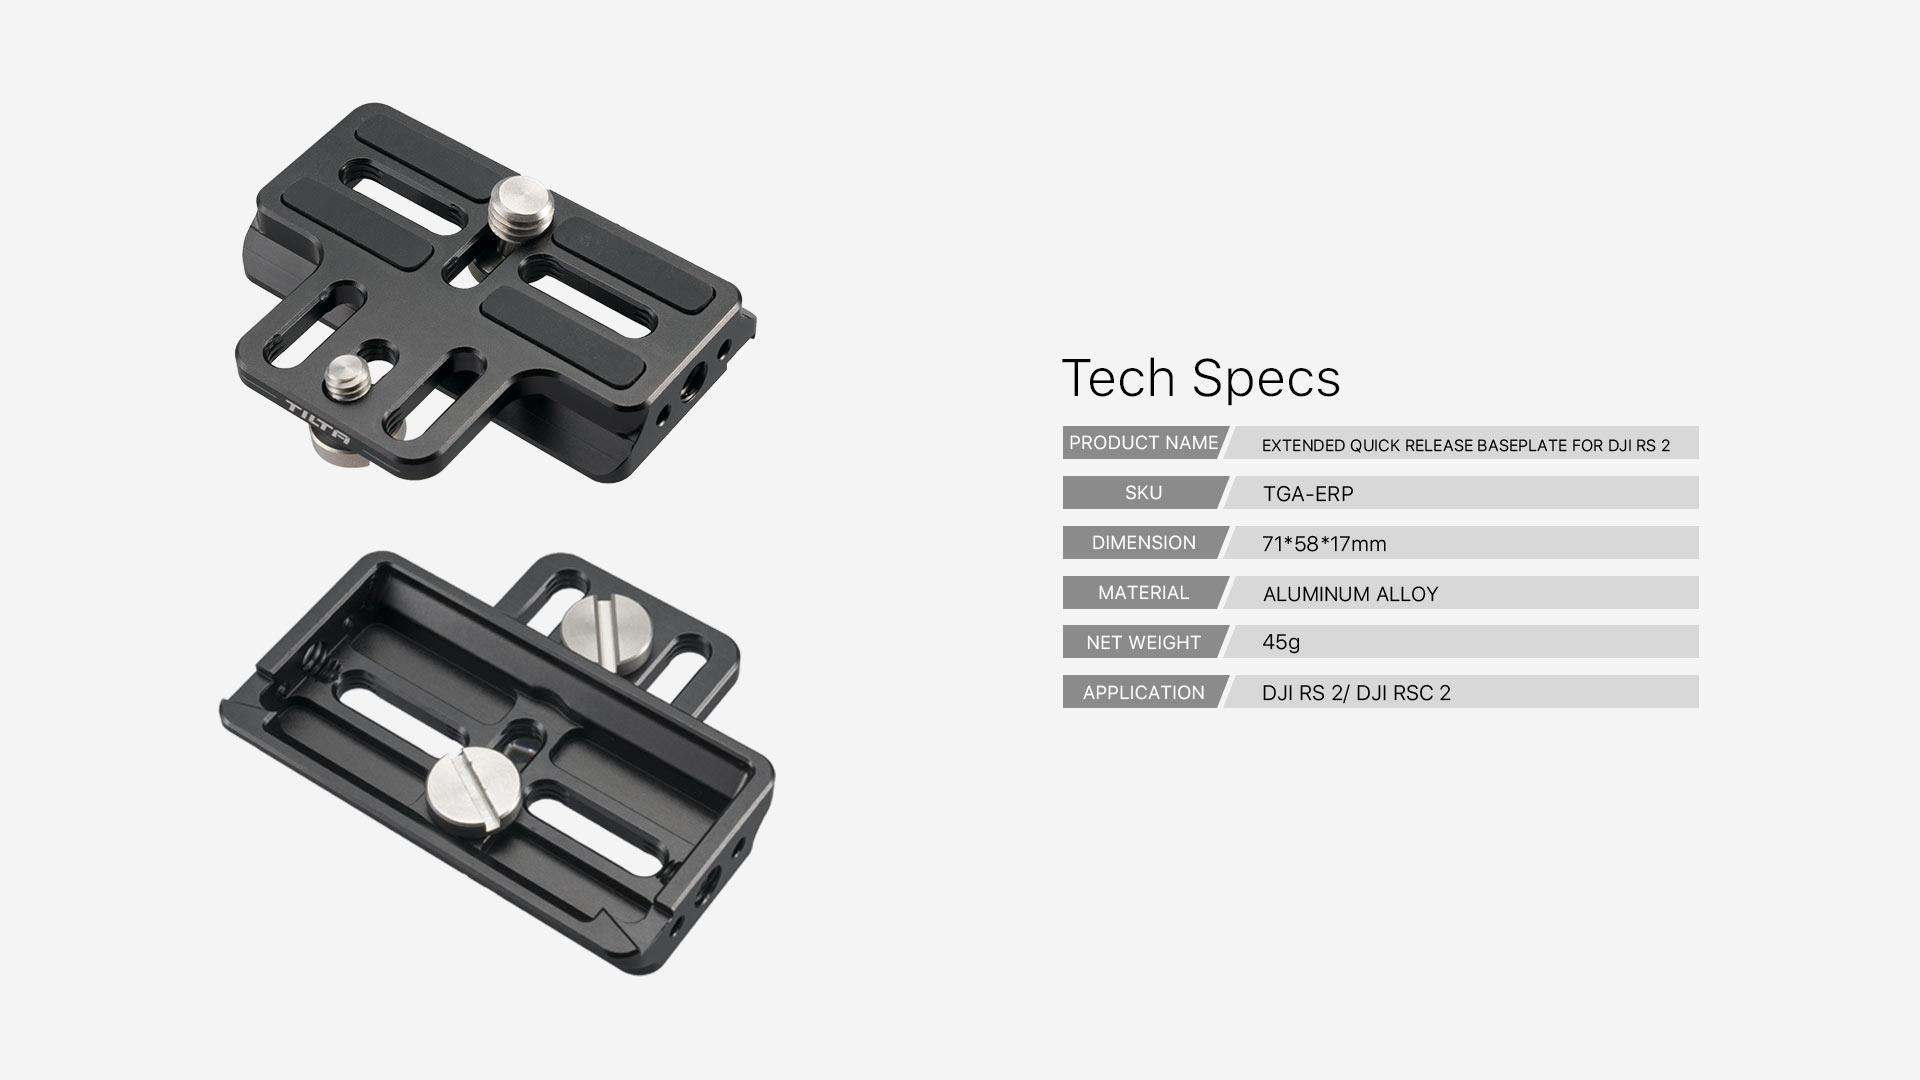 TGA-ERP tech specs